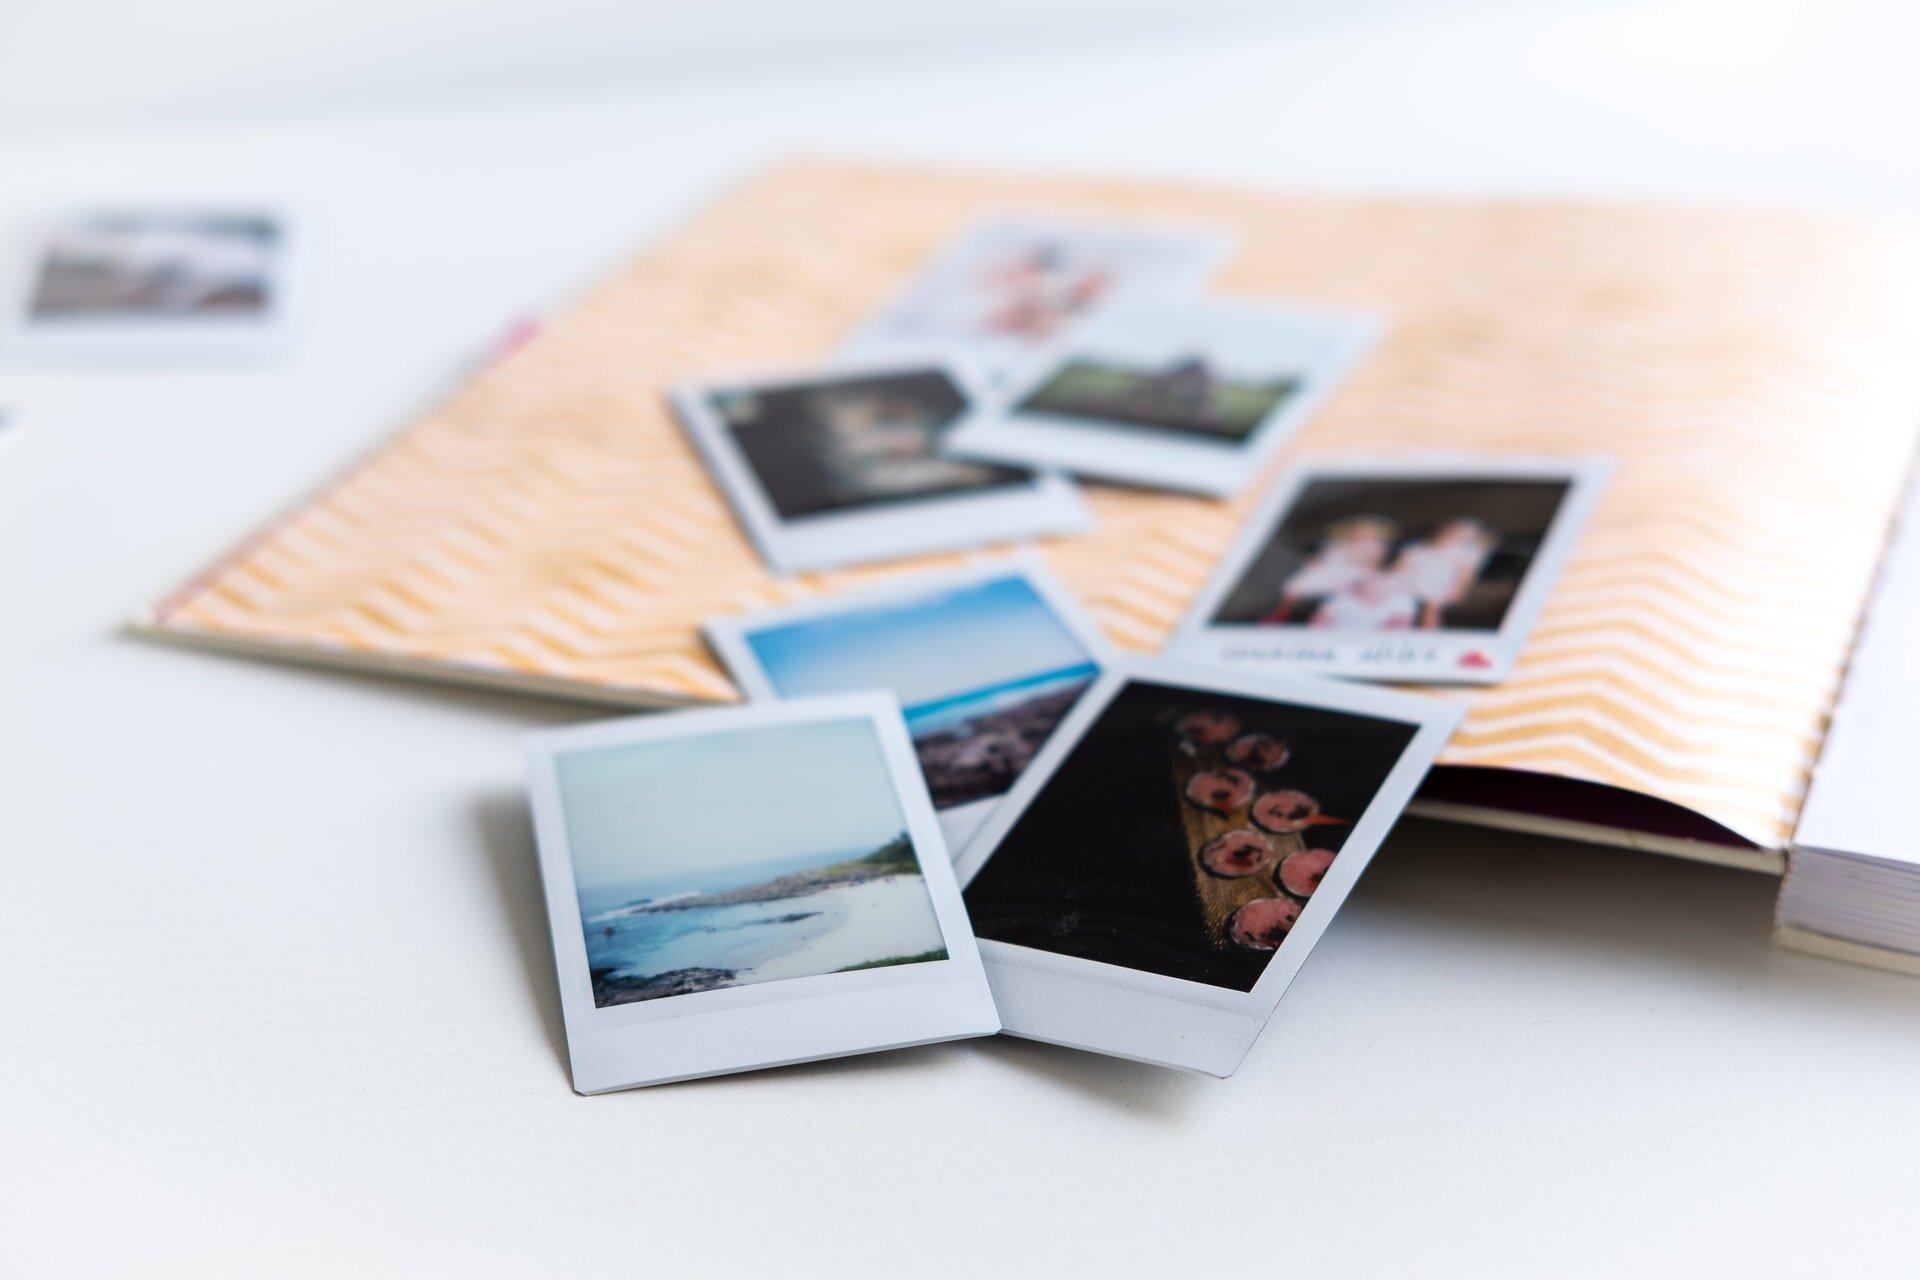 How to Turn Photos into Digital Scrapbooks